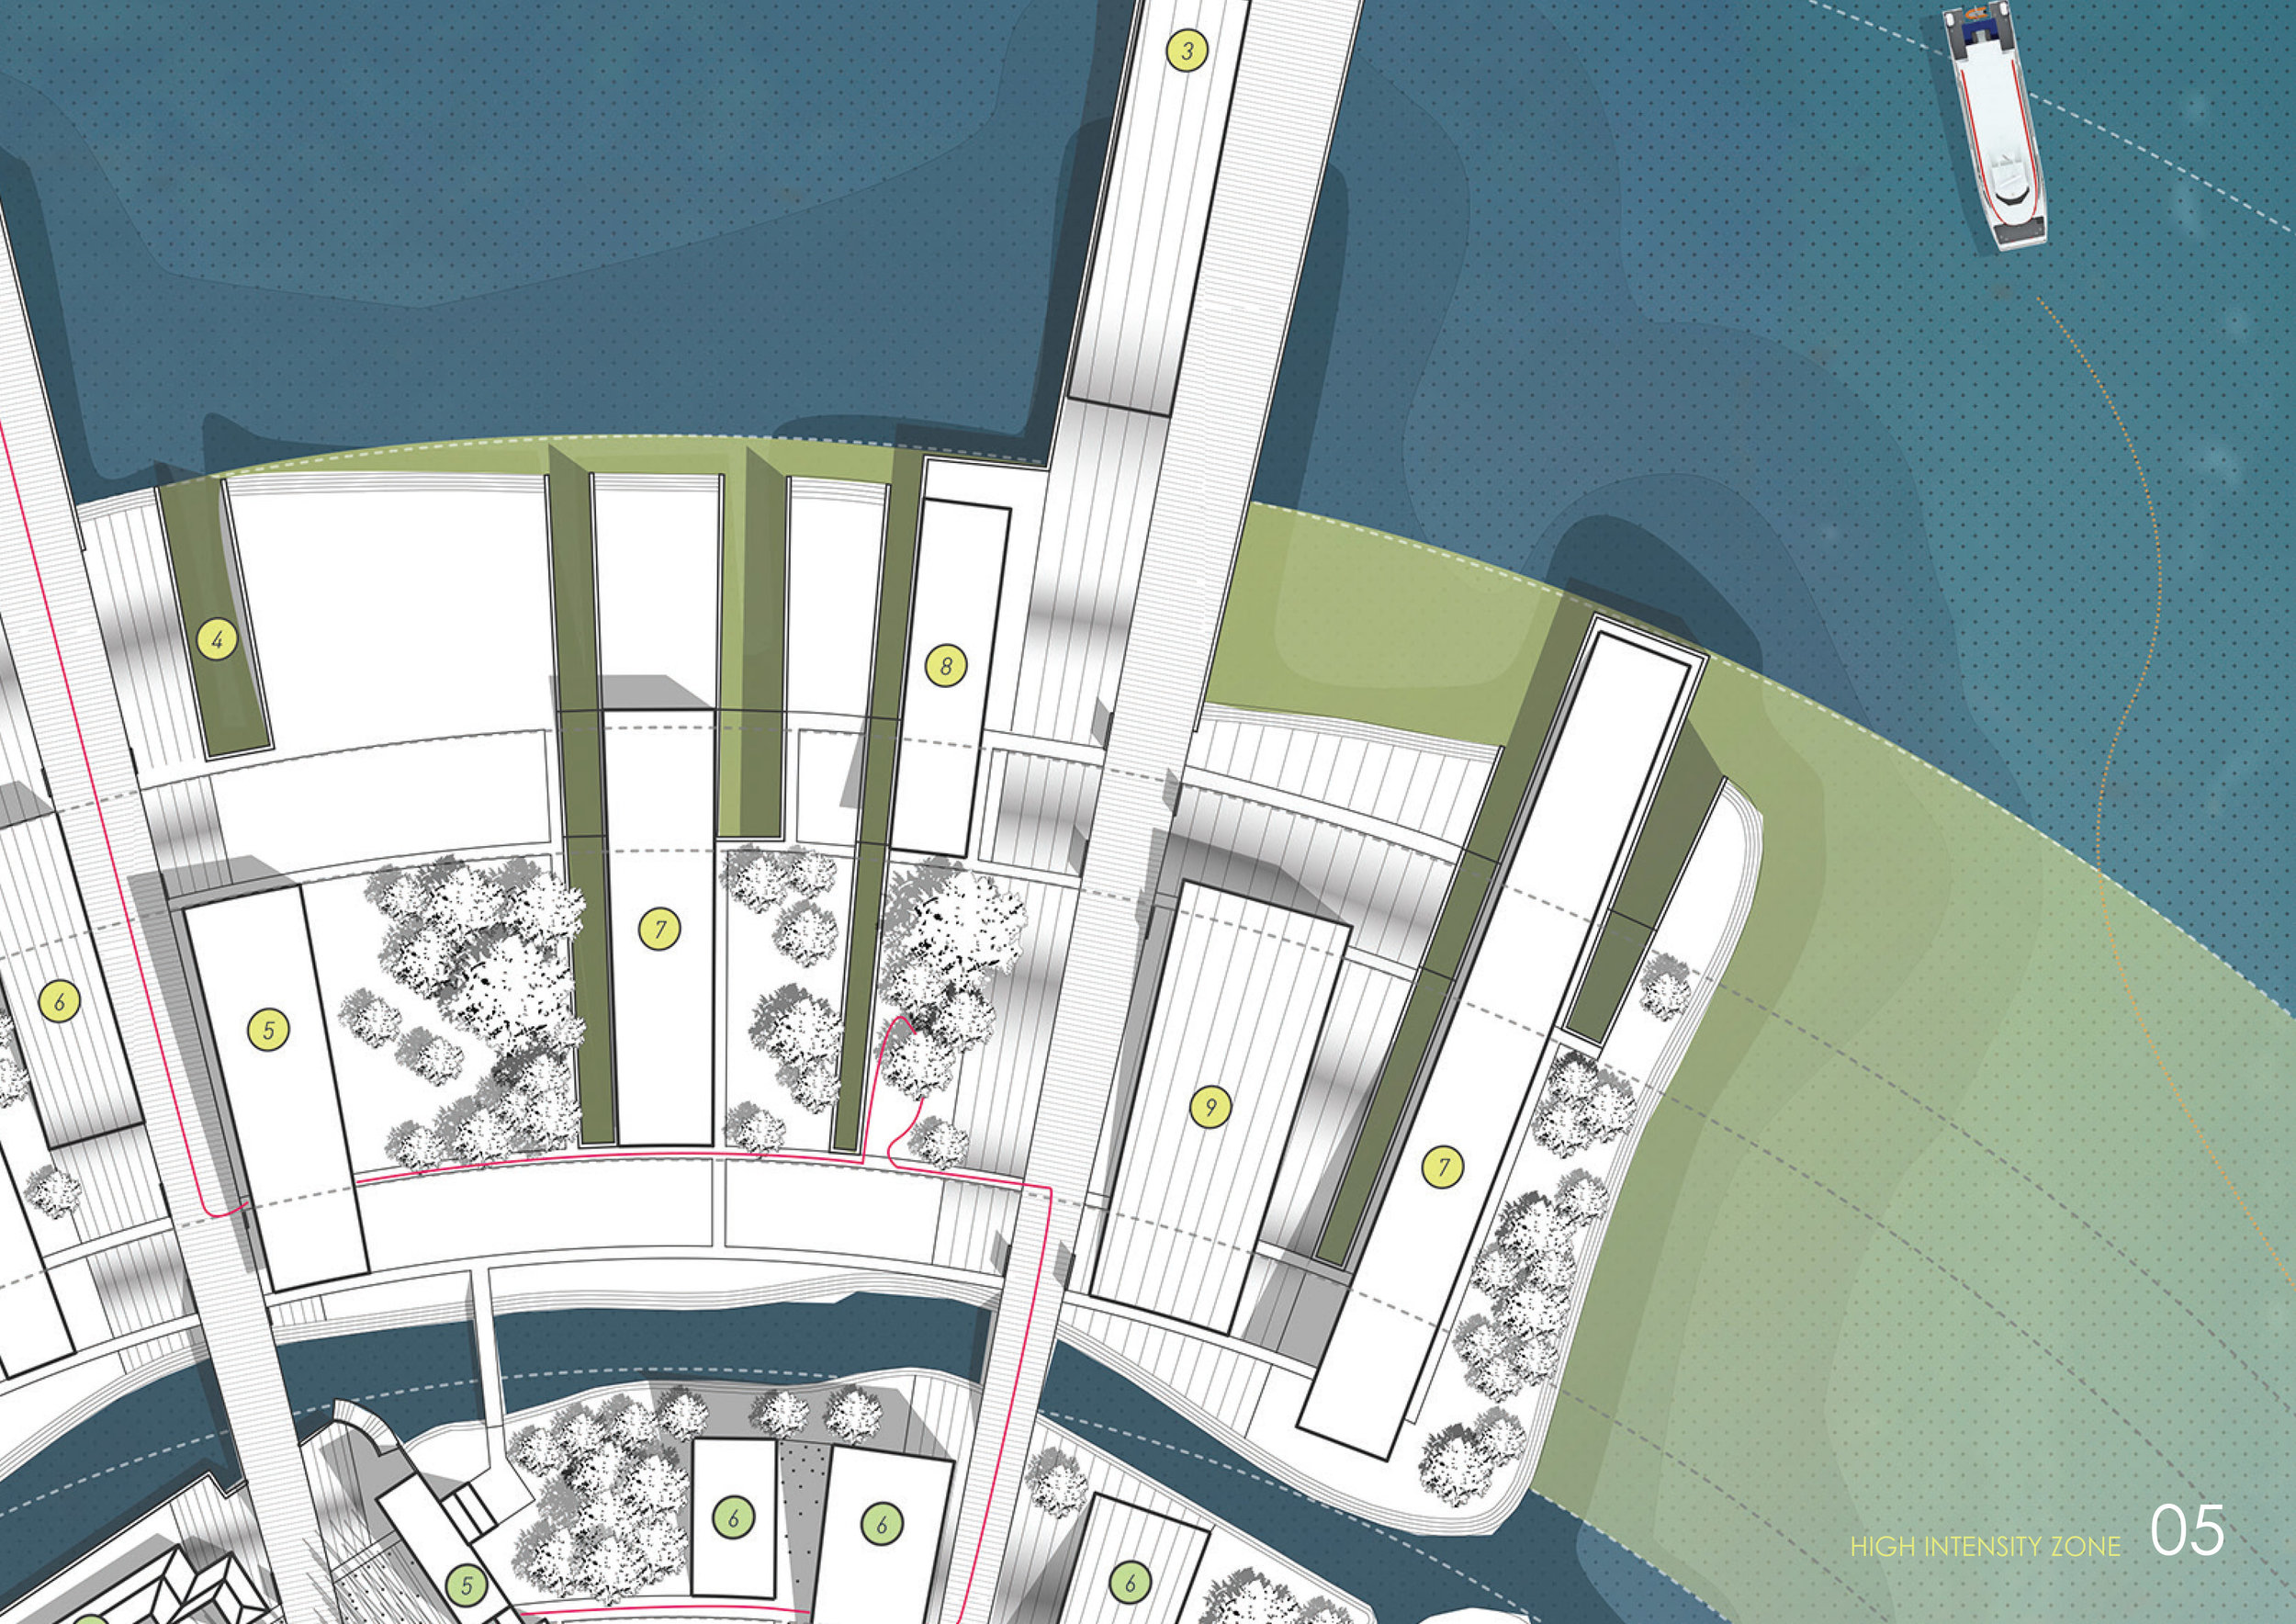 Univeristy Island Gradient Matt Fajkus Architecture MF MFx16_5.jpg